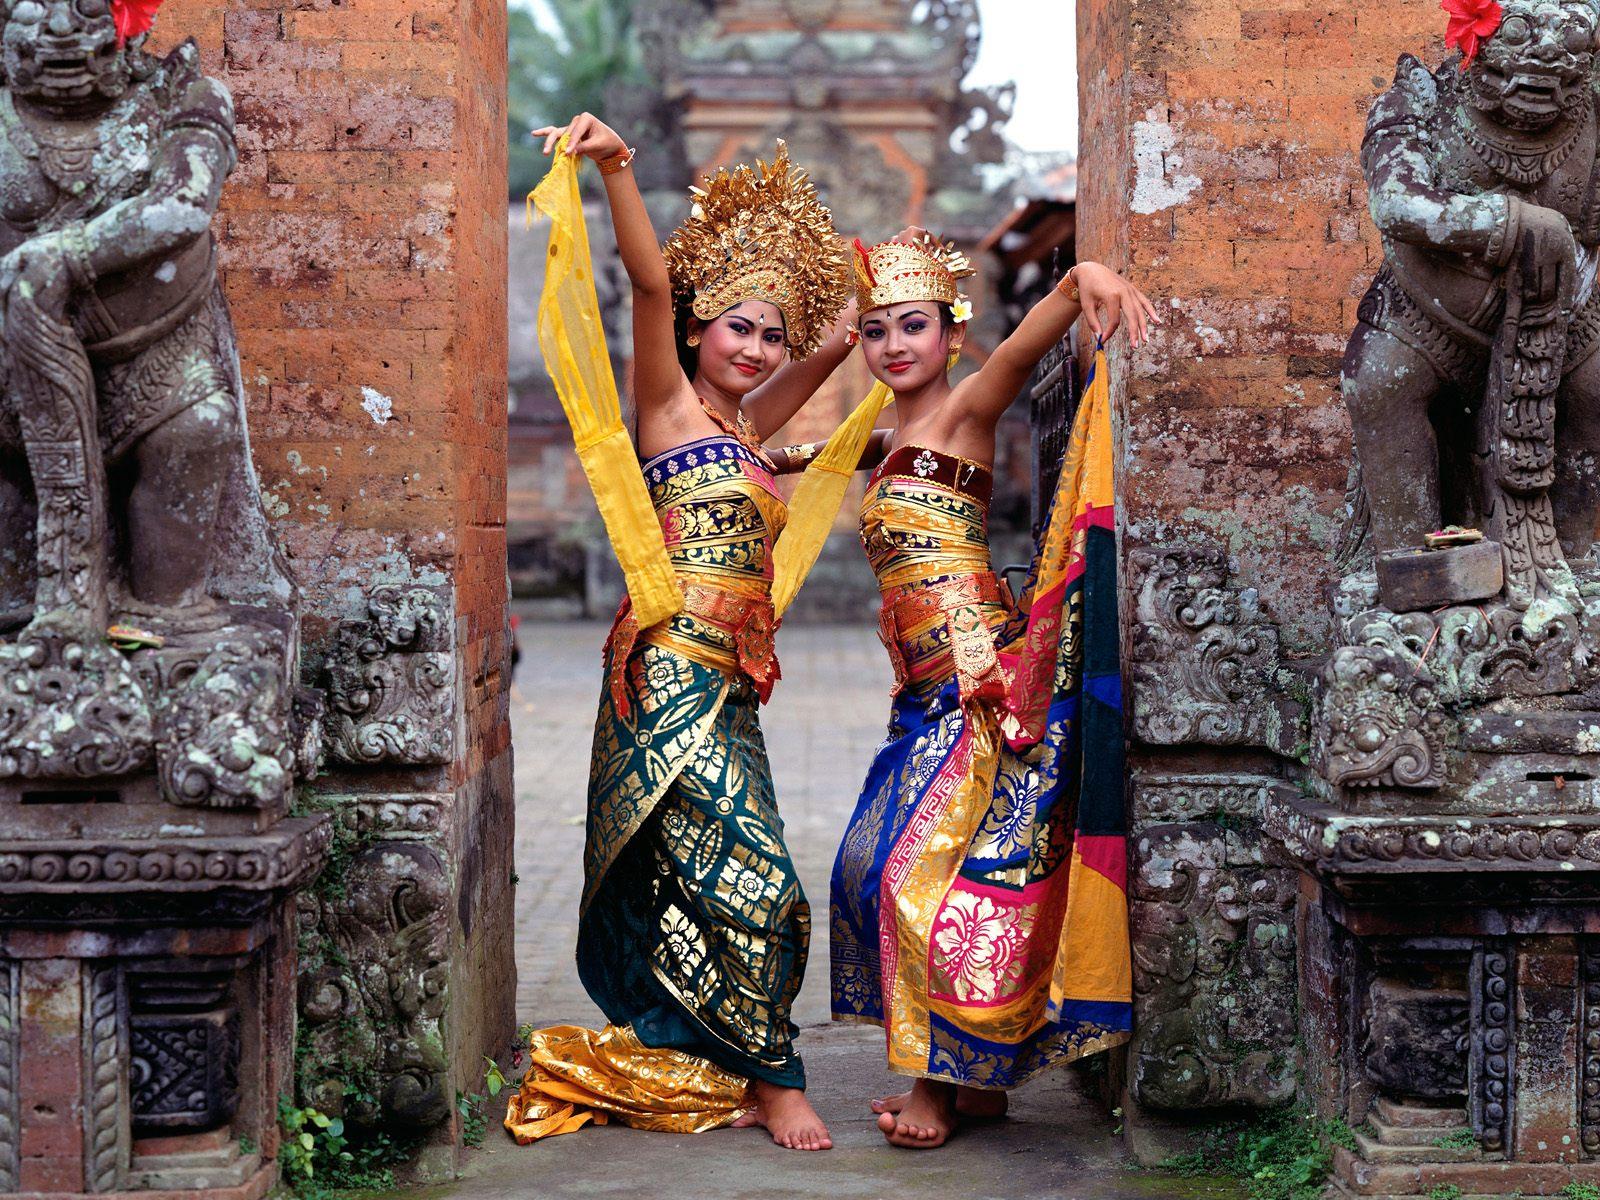 indonesia cultures culture bali balinese religion indonesian jakarta dancers java medan moments sumatra bandung depok asia unique